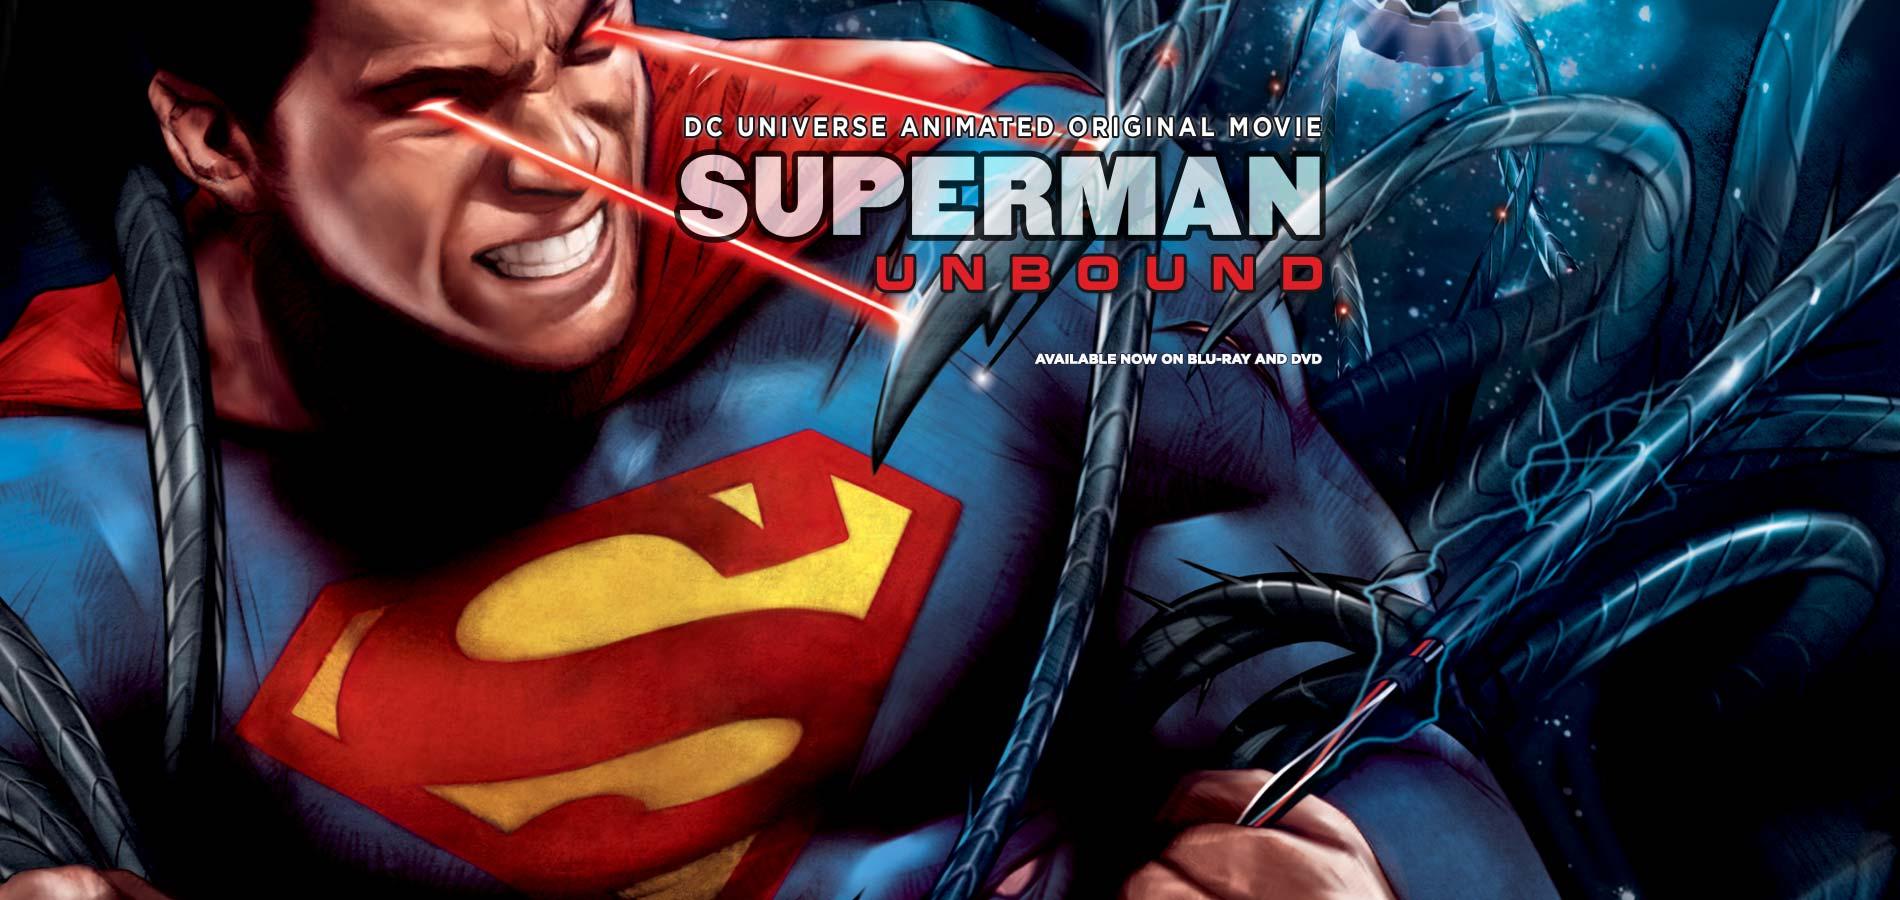 GalleryMovies 1900x900 SupermanUnbound 52abb6e1da4aa7.84877636 - Superman: Unbound (2013)